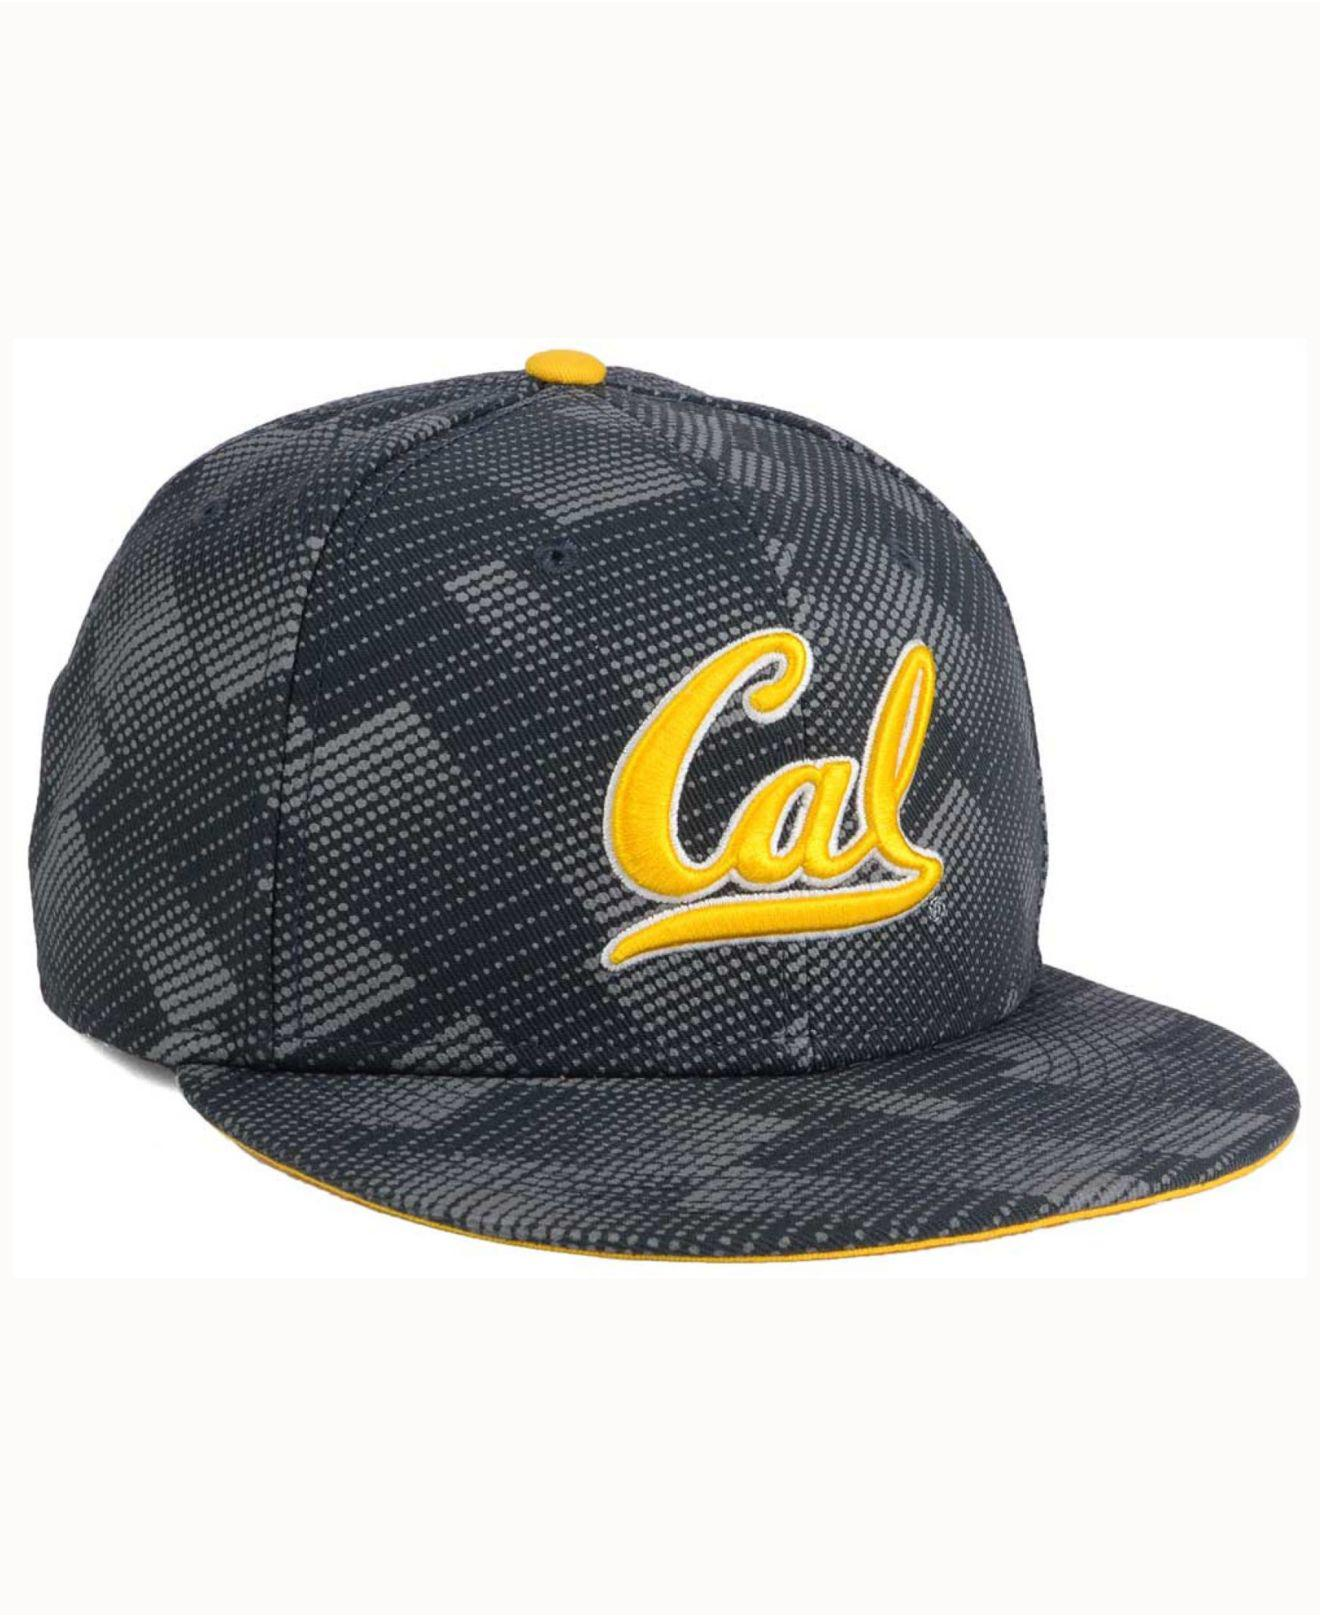 outlet store 38c74 5128f ... hot nike multicolor california golden bears anthracite snapback cap for  men lyst. view fullscreen 523cd